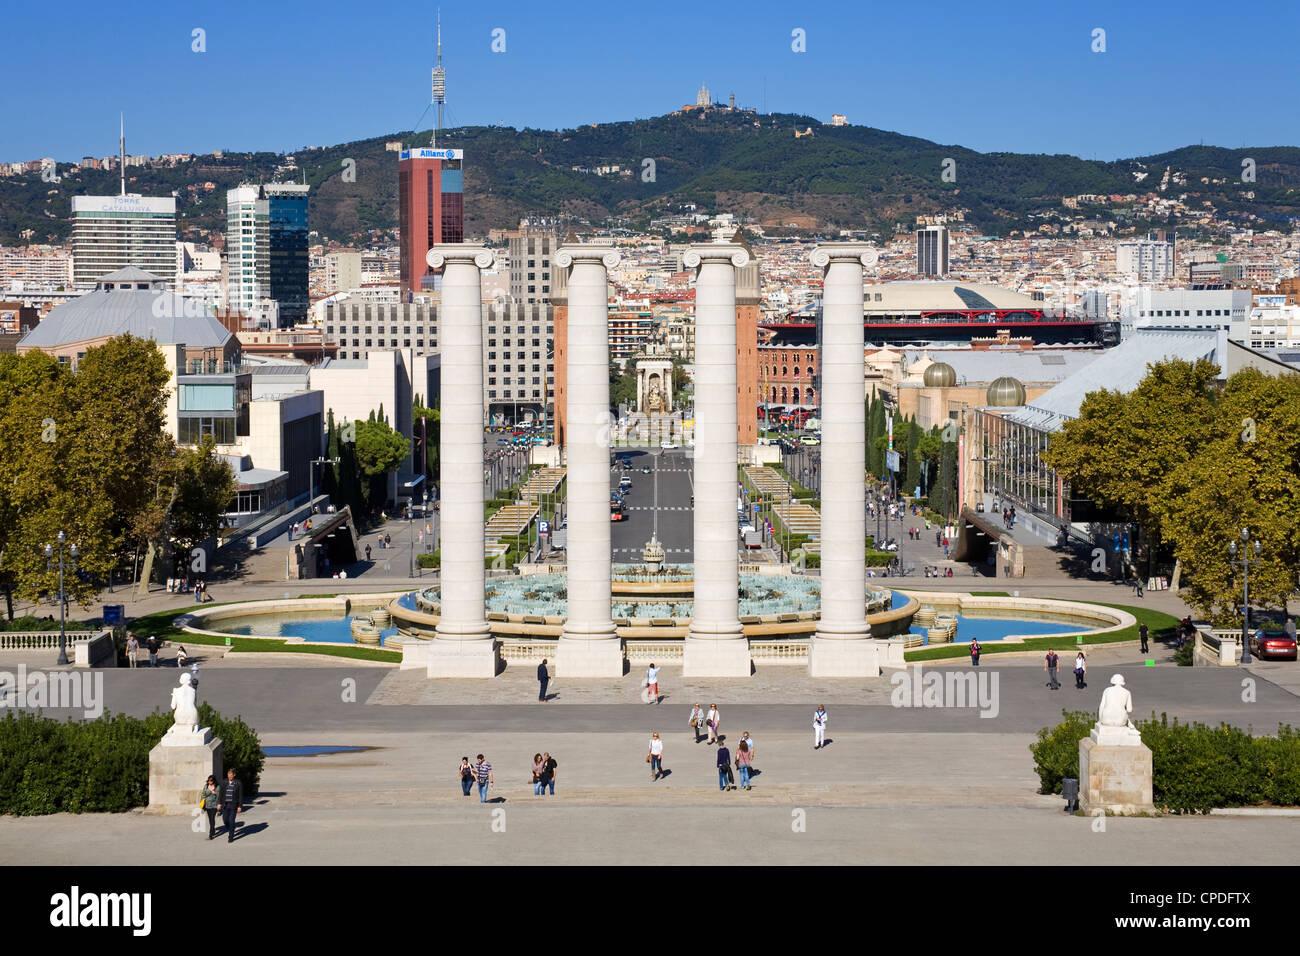 Reina Maria Cristina Avenue in Montjuic District, Barcelona, Catalonia, Spain, Europe - Stock Image